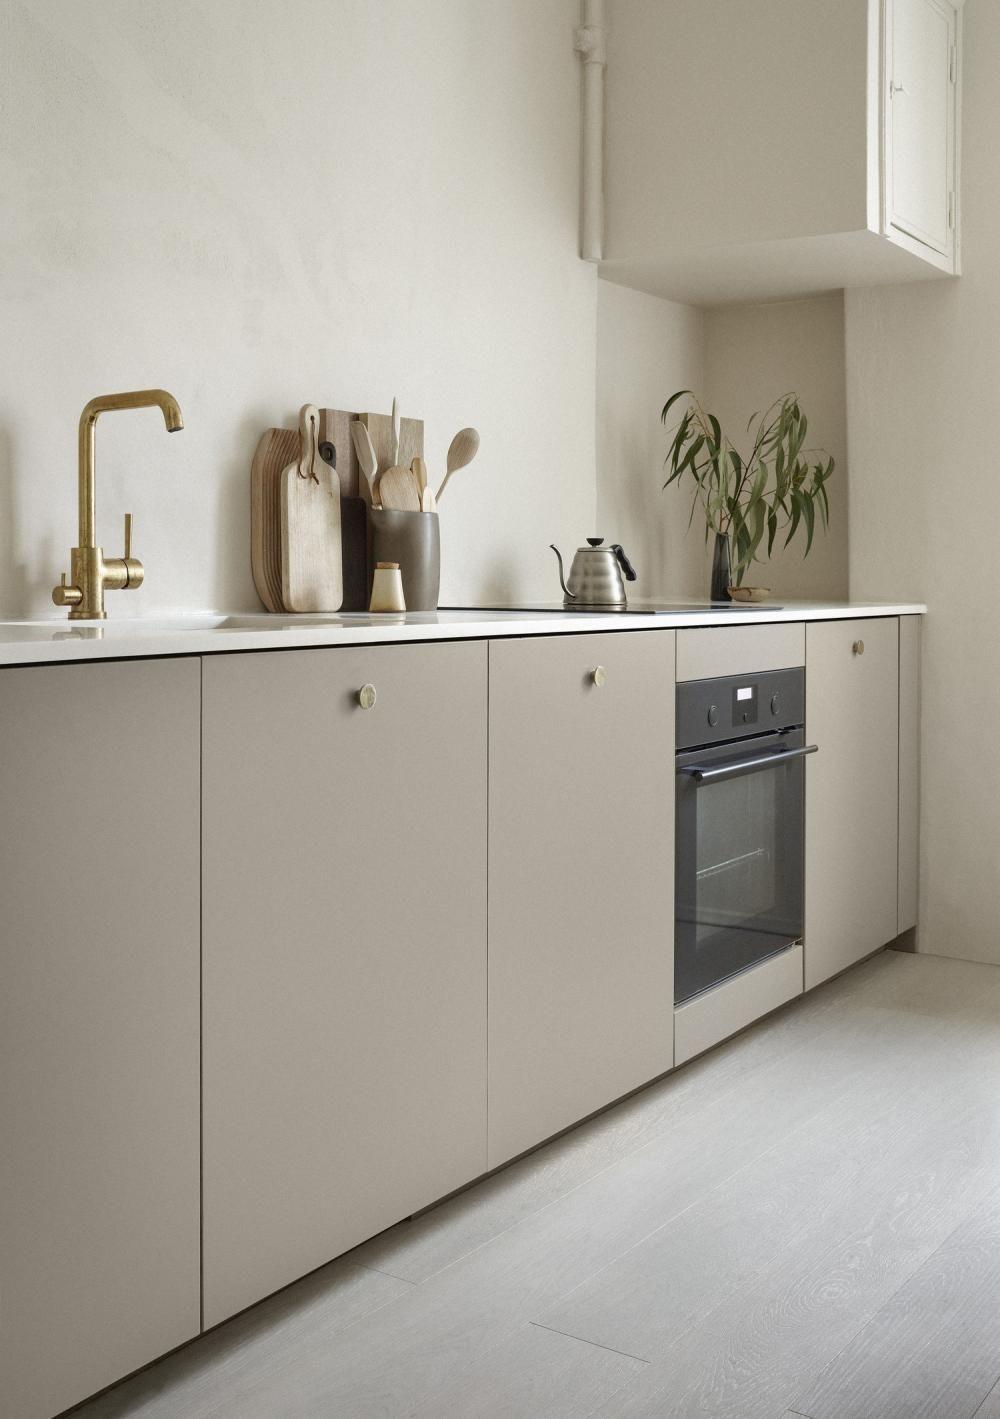 Super beige keuken   Beige keuken, Keukens, Keuken ontwerp YG-58